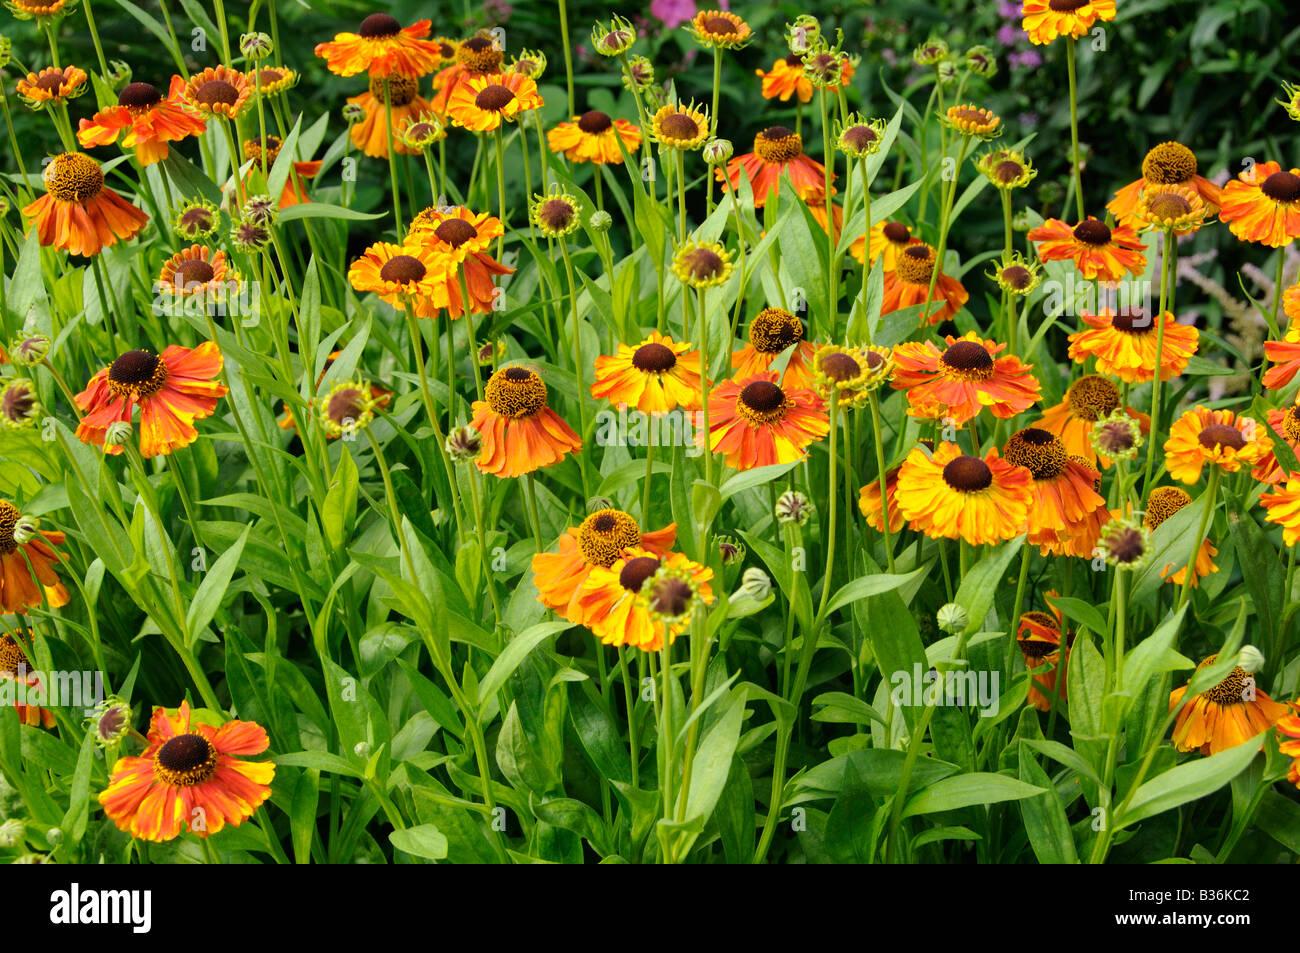 Helenium Moerheim Beauty flowering in summer garden Norfolk UK August - Stock Image